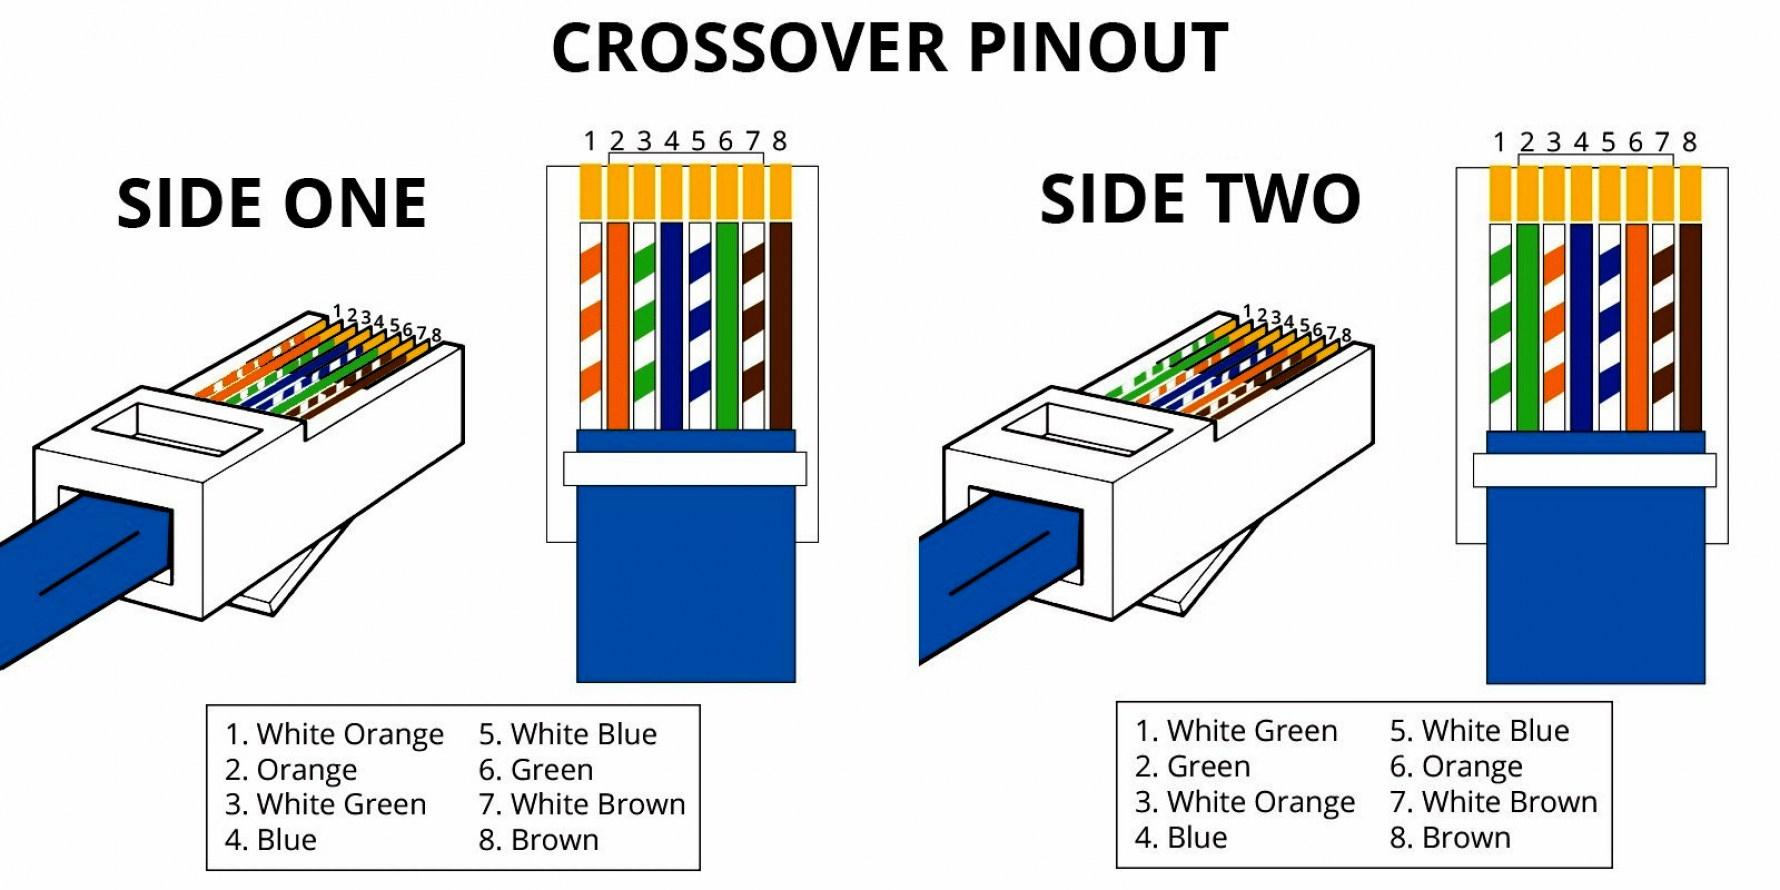 Cat5 B Wiring Diagram Printable | Wiring Diagram - Cat5 Wiring Diagram B